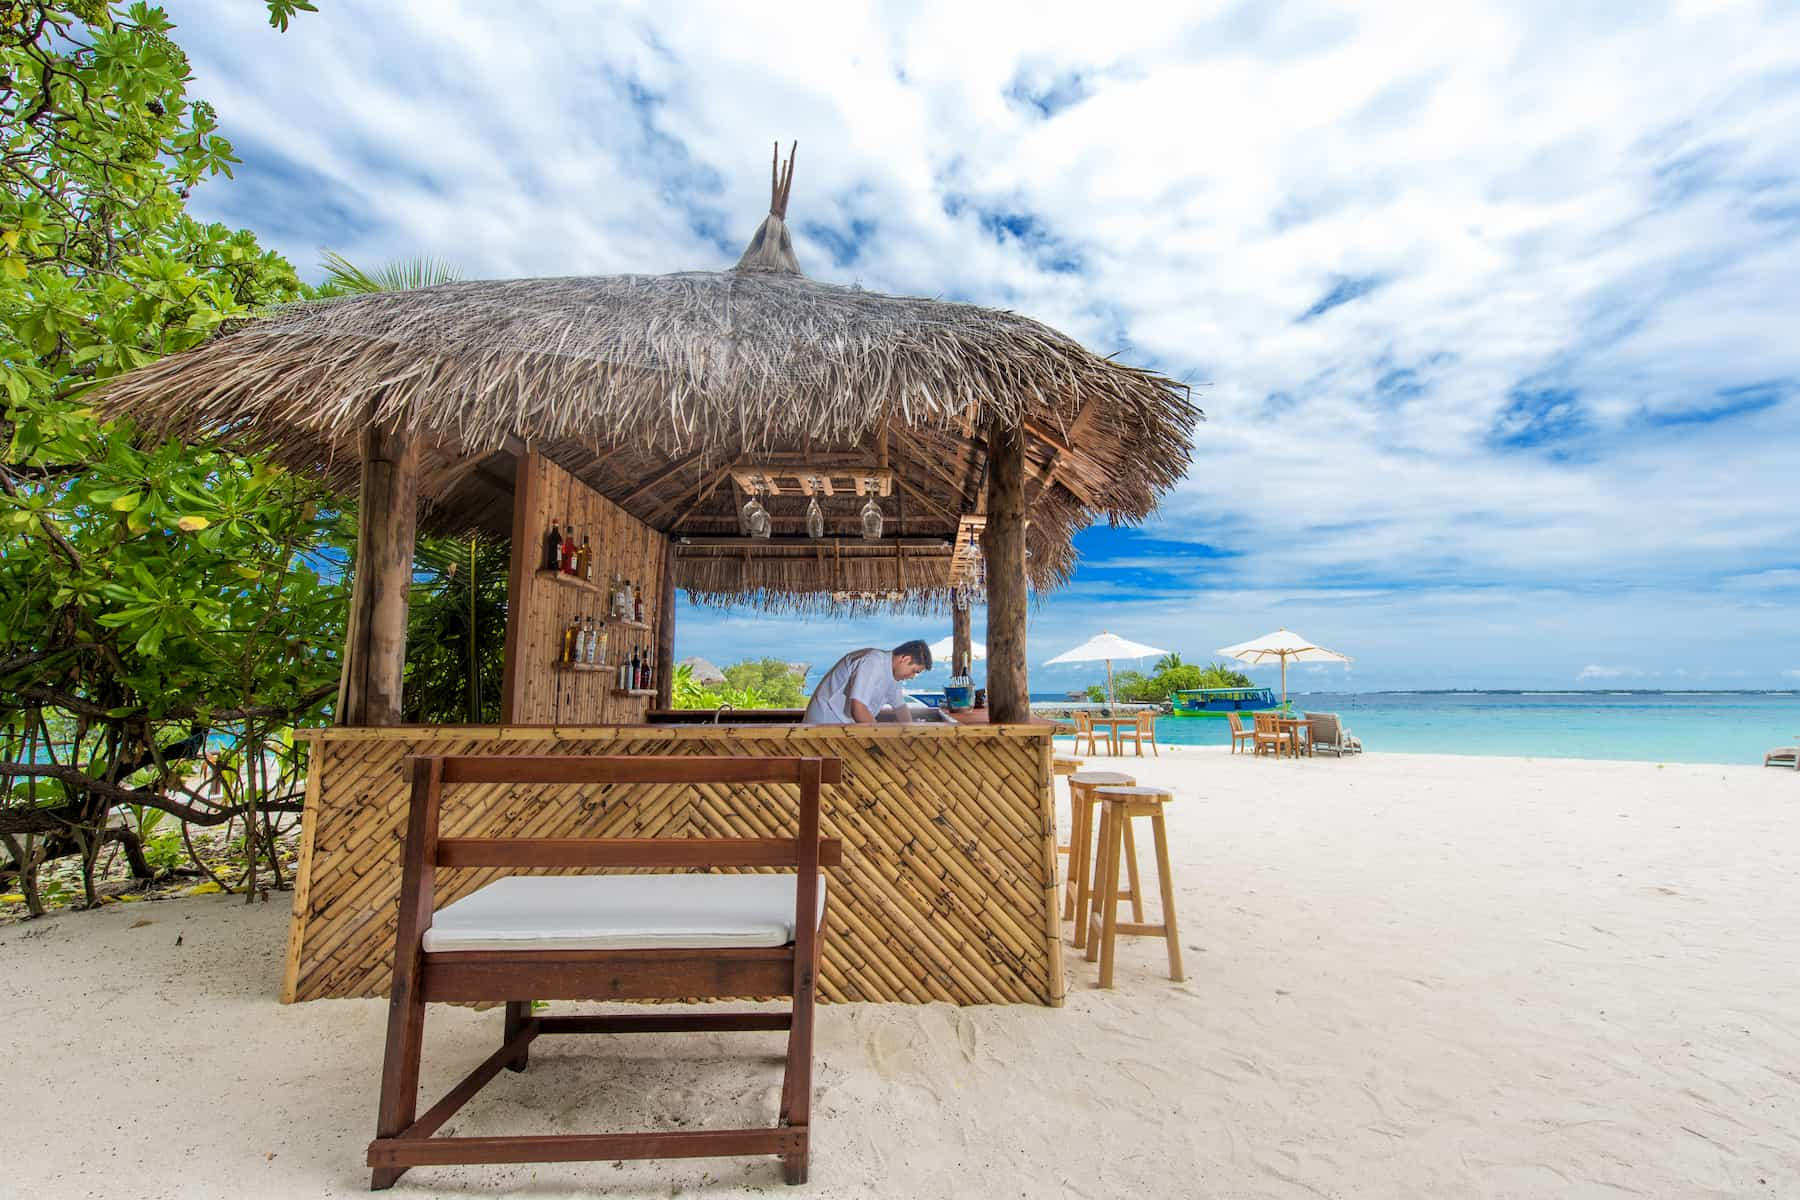 Viaggio ale Maldive Makunudu Island Ristorante Myaru Bar